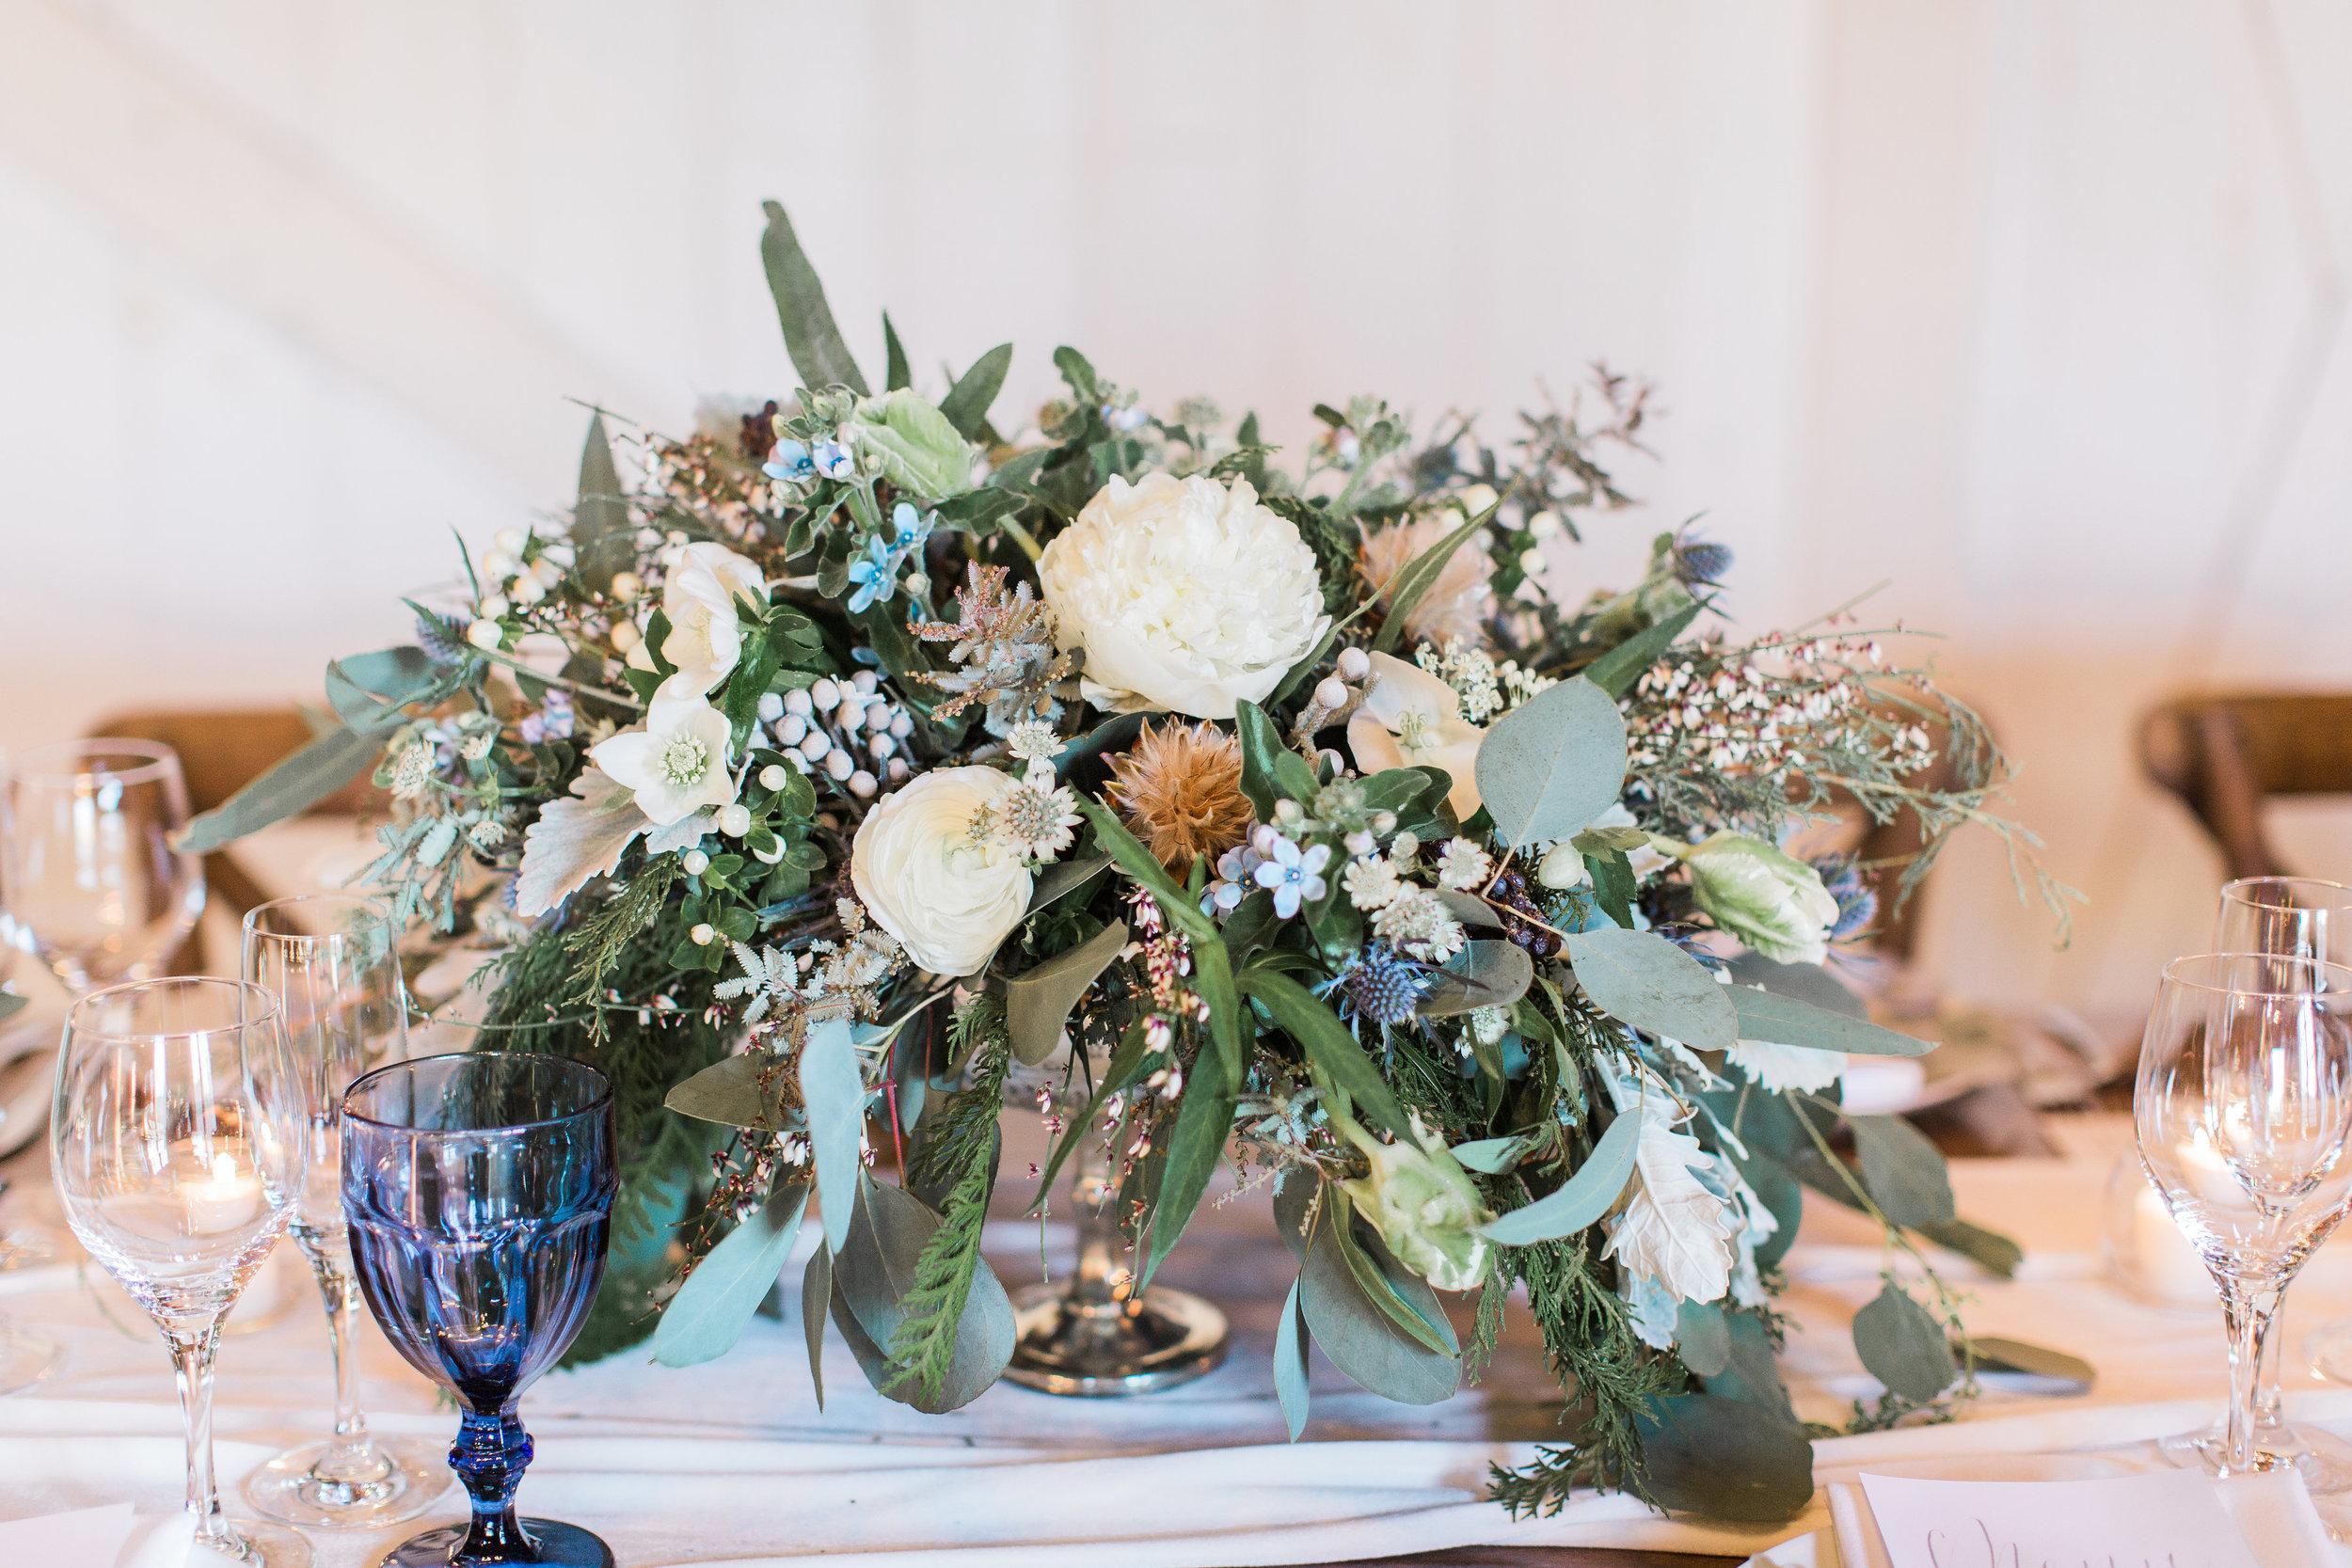 Cunningham_Farm_Winter_Styled_Wedding_Shoot_Meredith_Jane_Photography-144.jpg